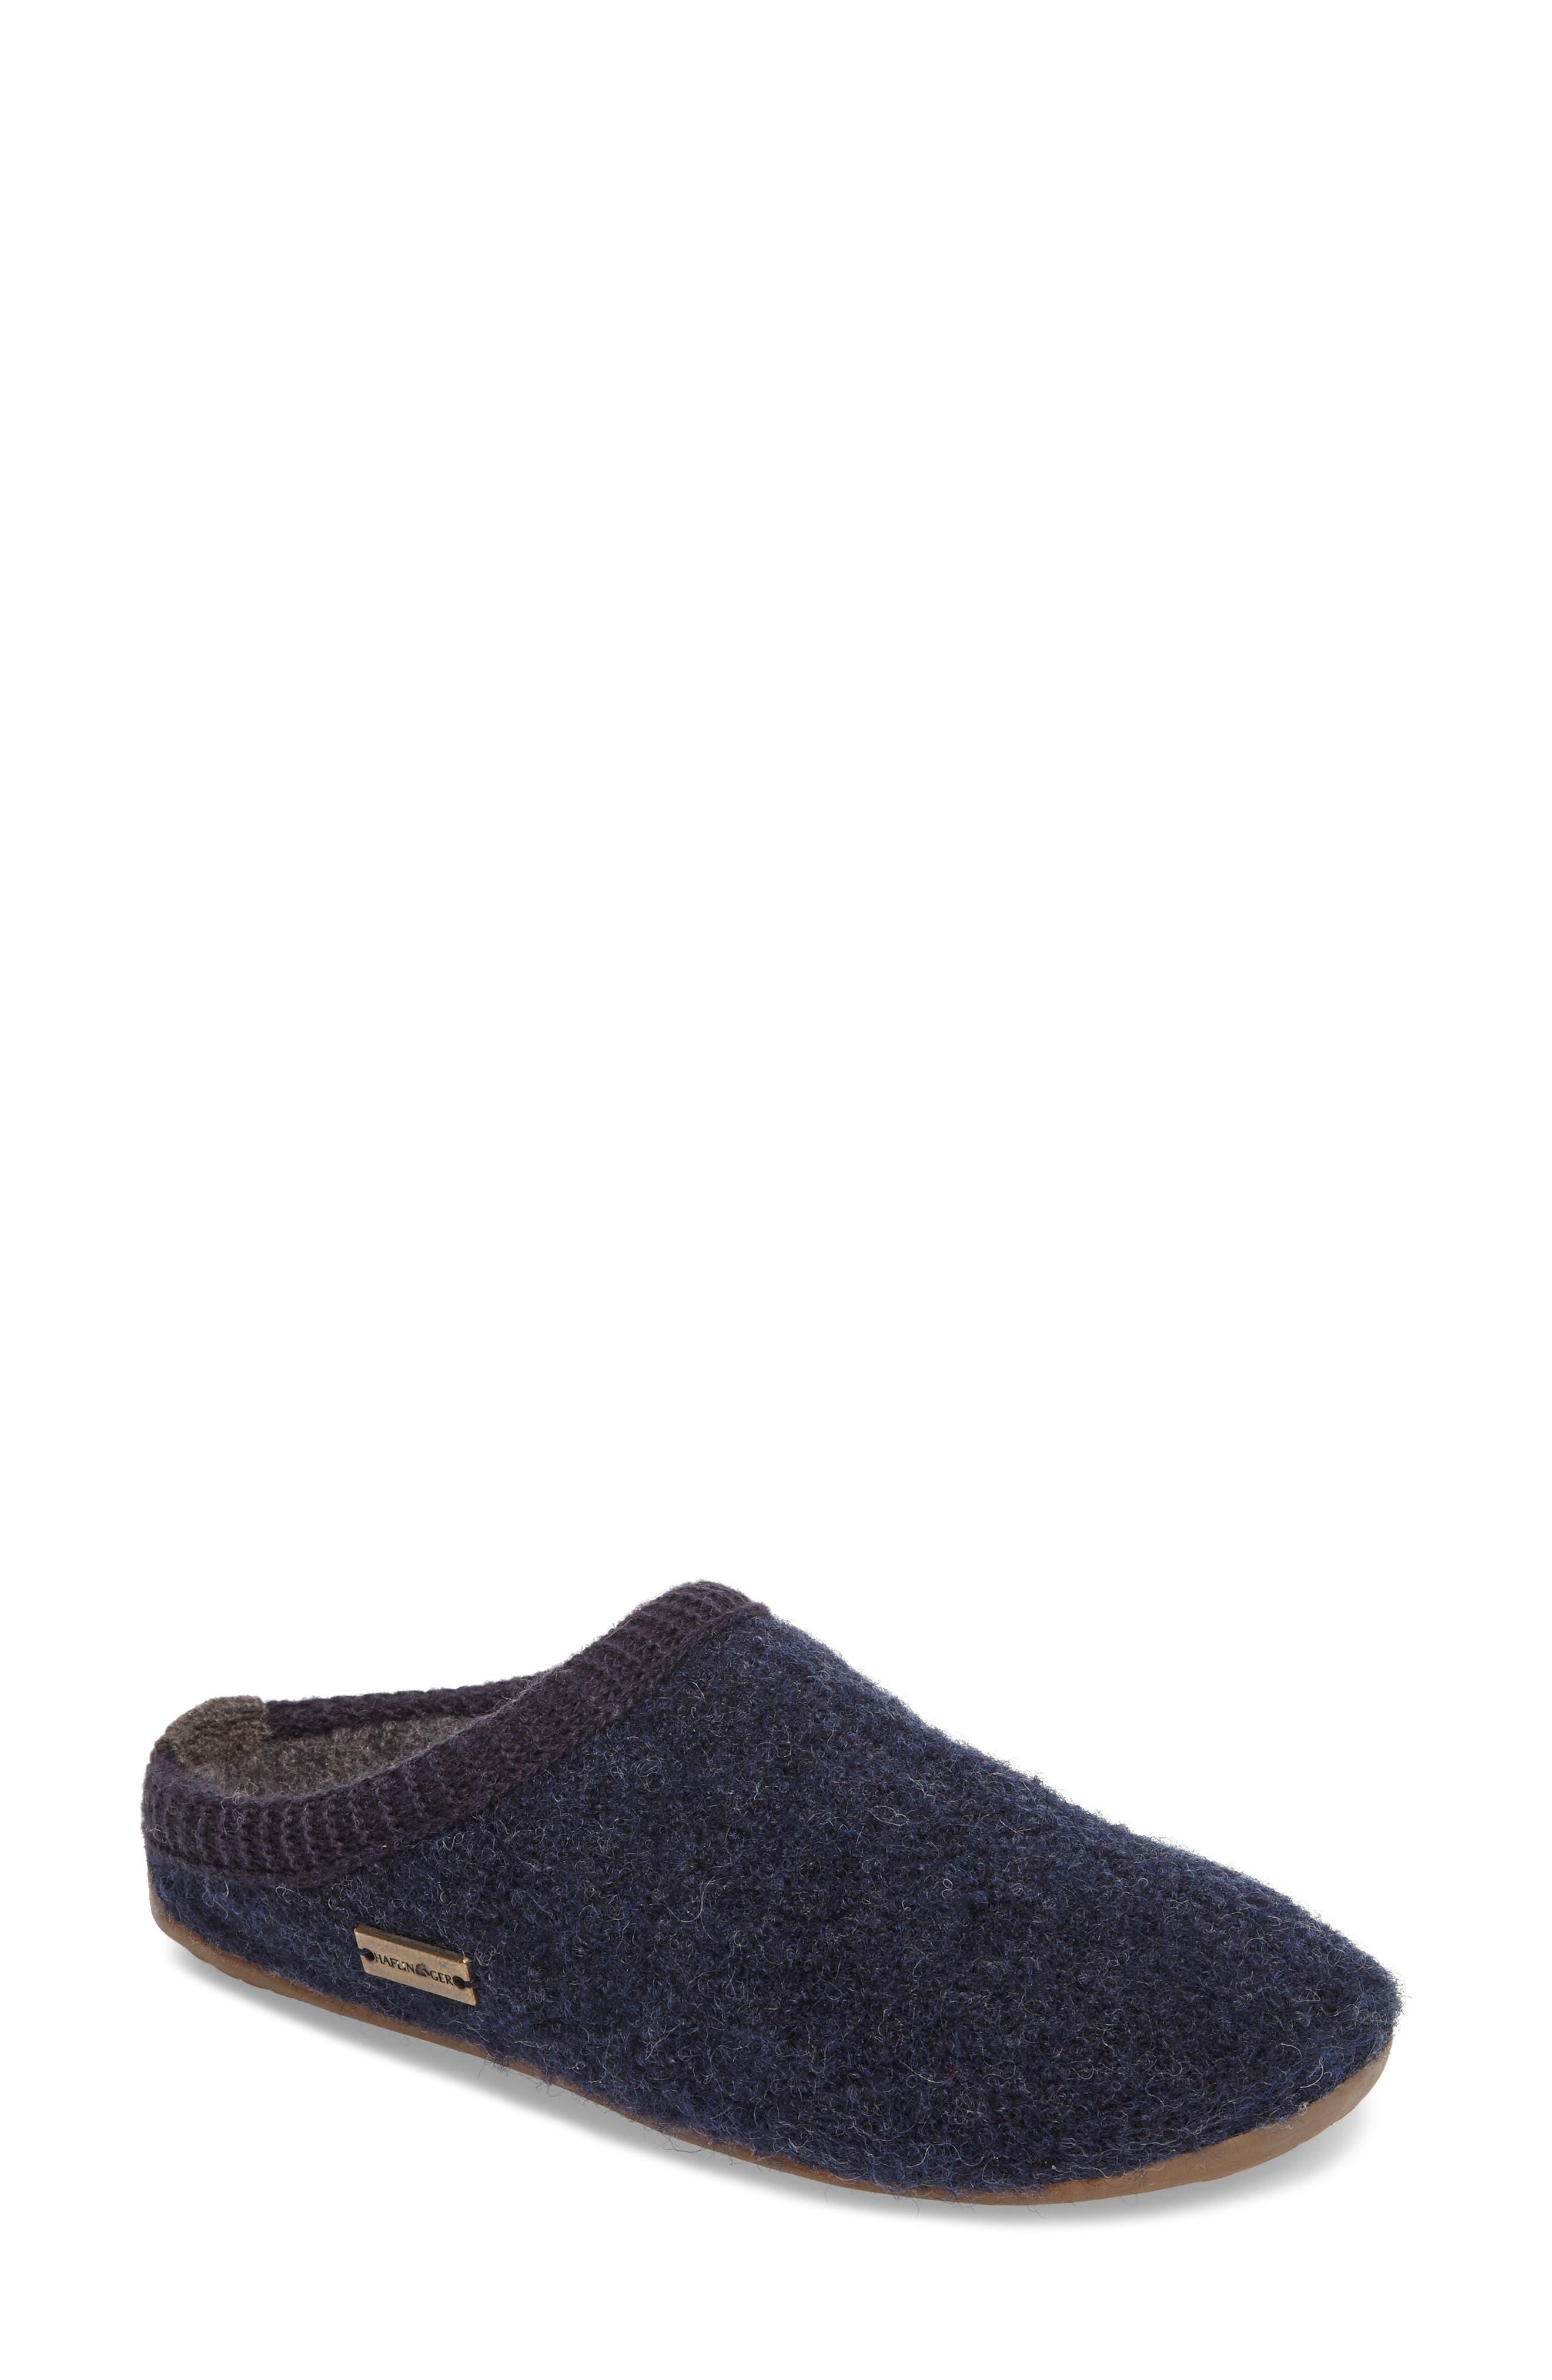 Dynamic Slipper,                         Main,                         color, 410